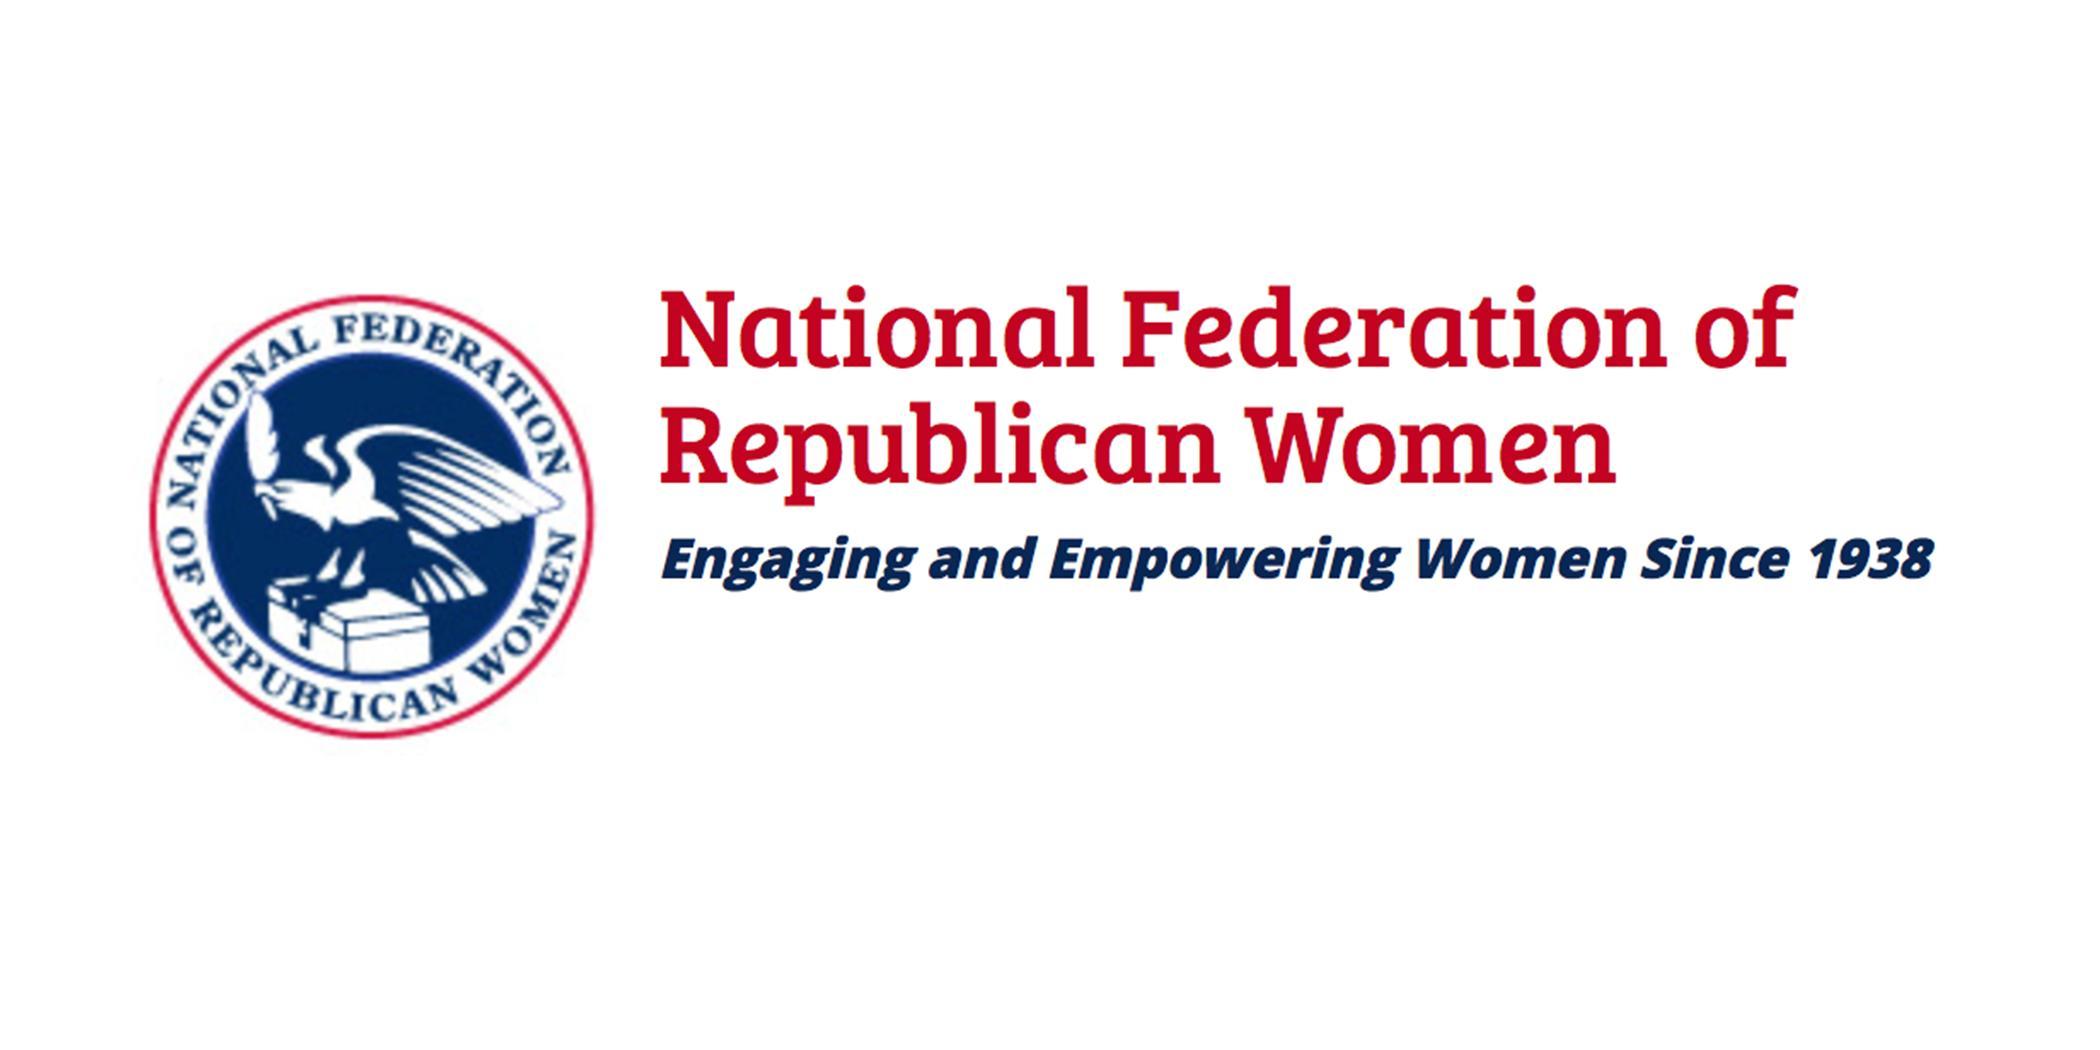 National Federation.jpg